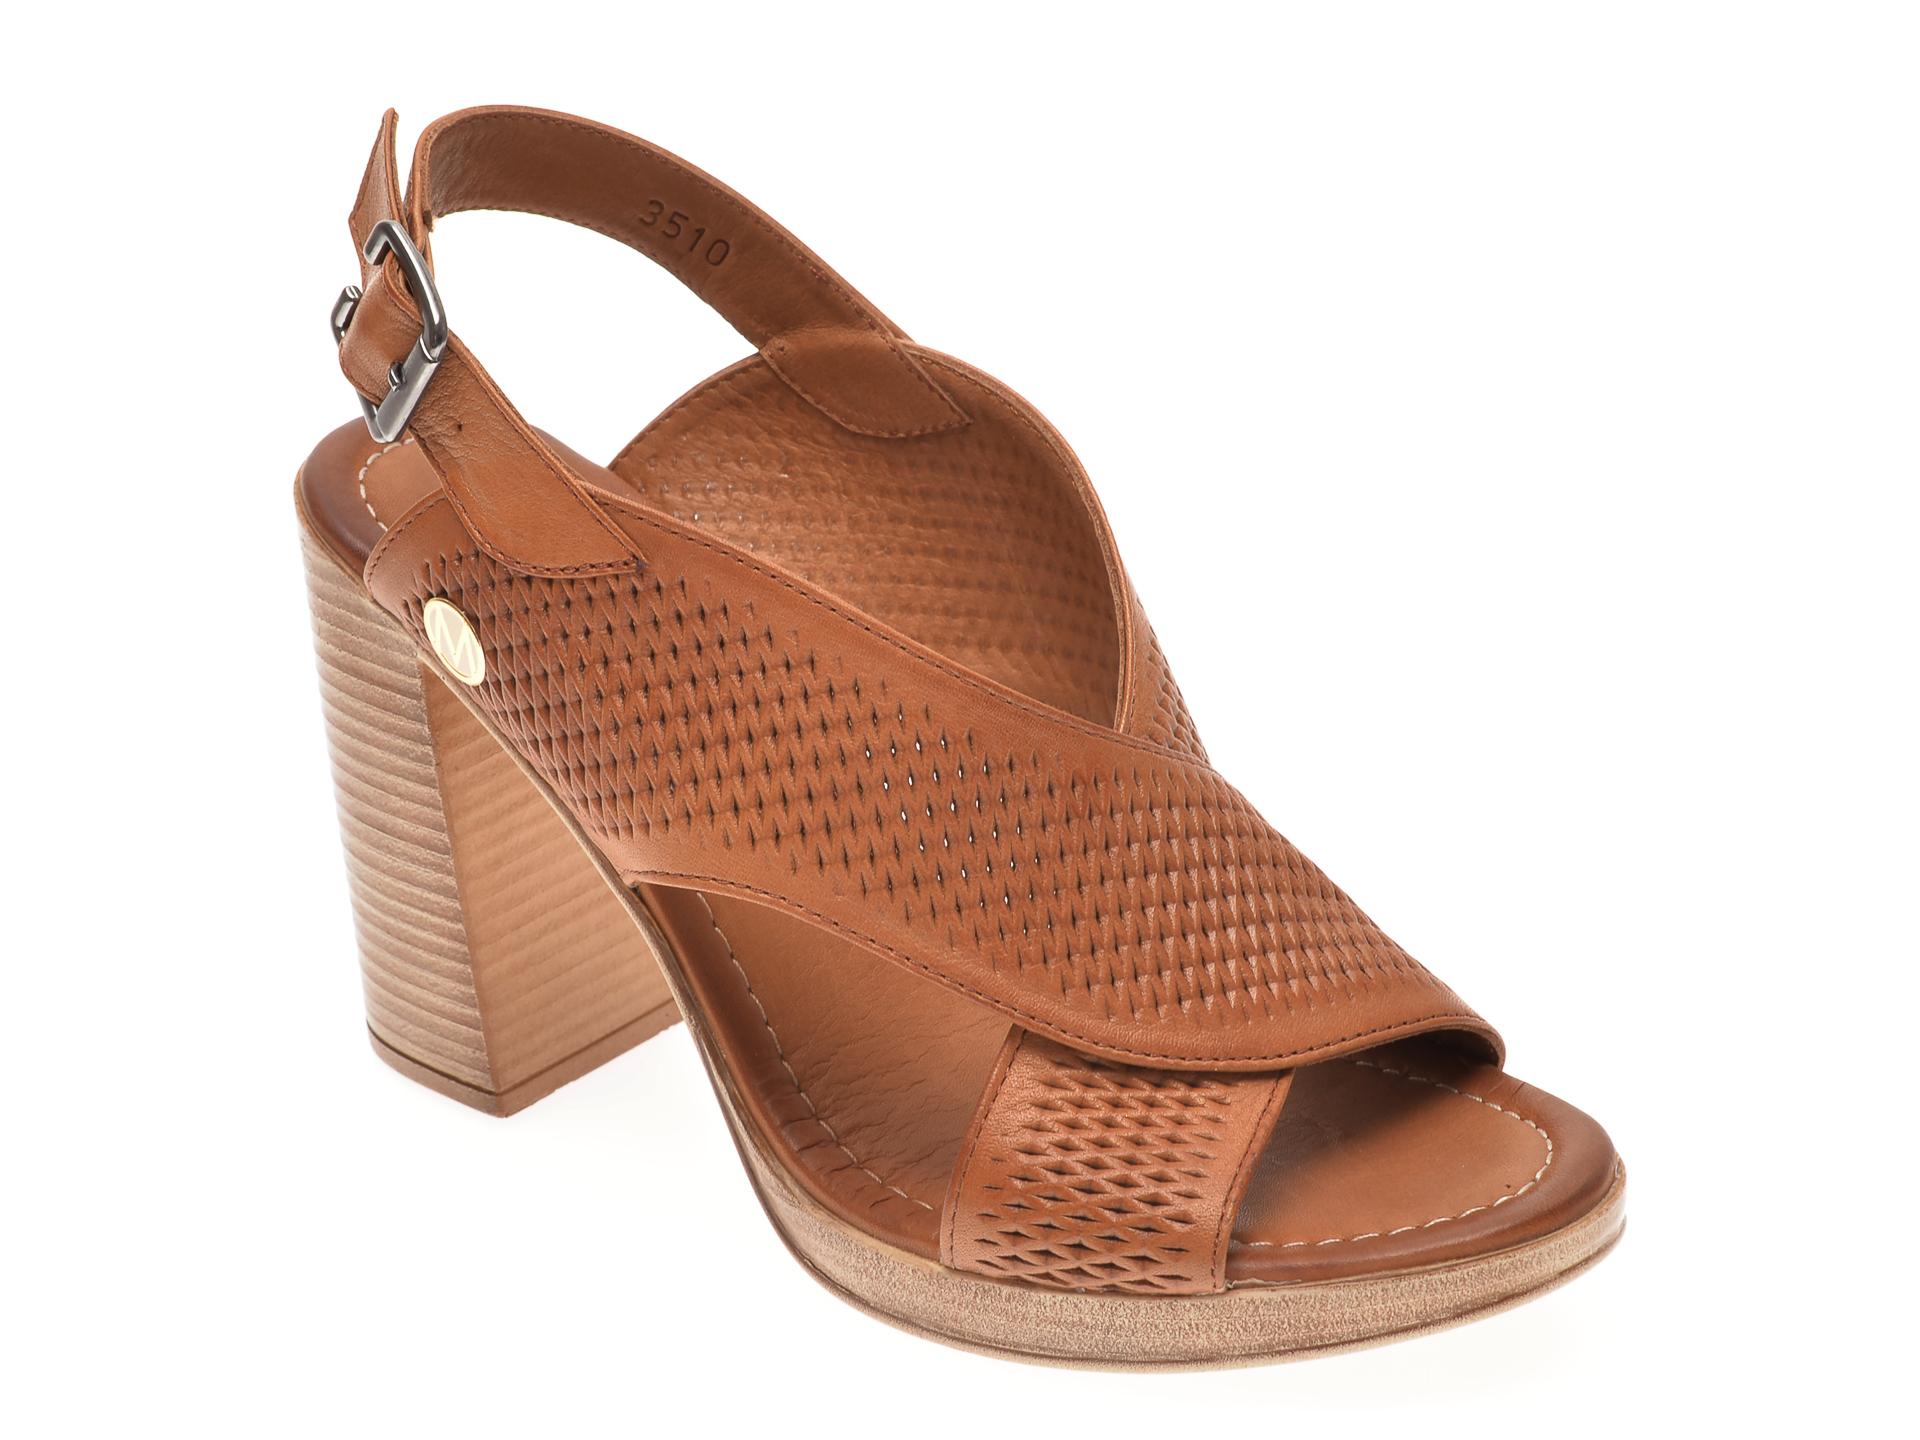 Sandale MESSIMODA maro, 20Y3510, din piele naturala